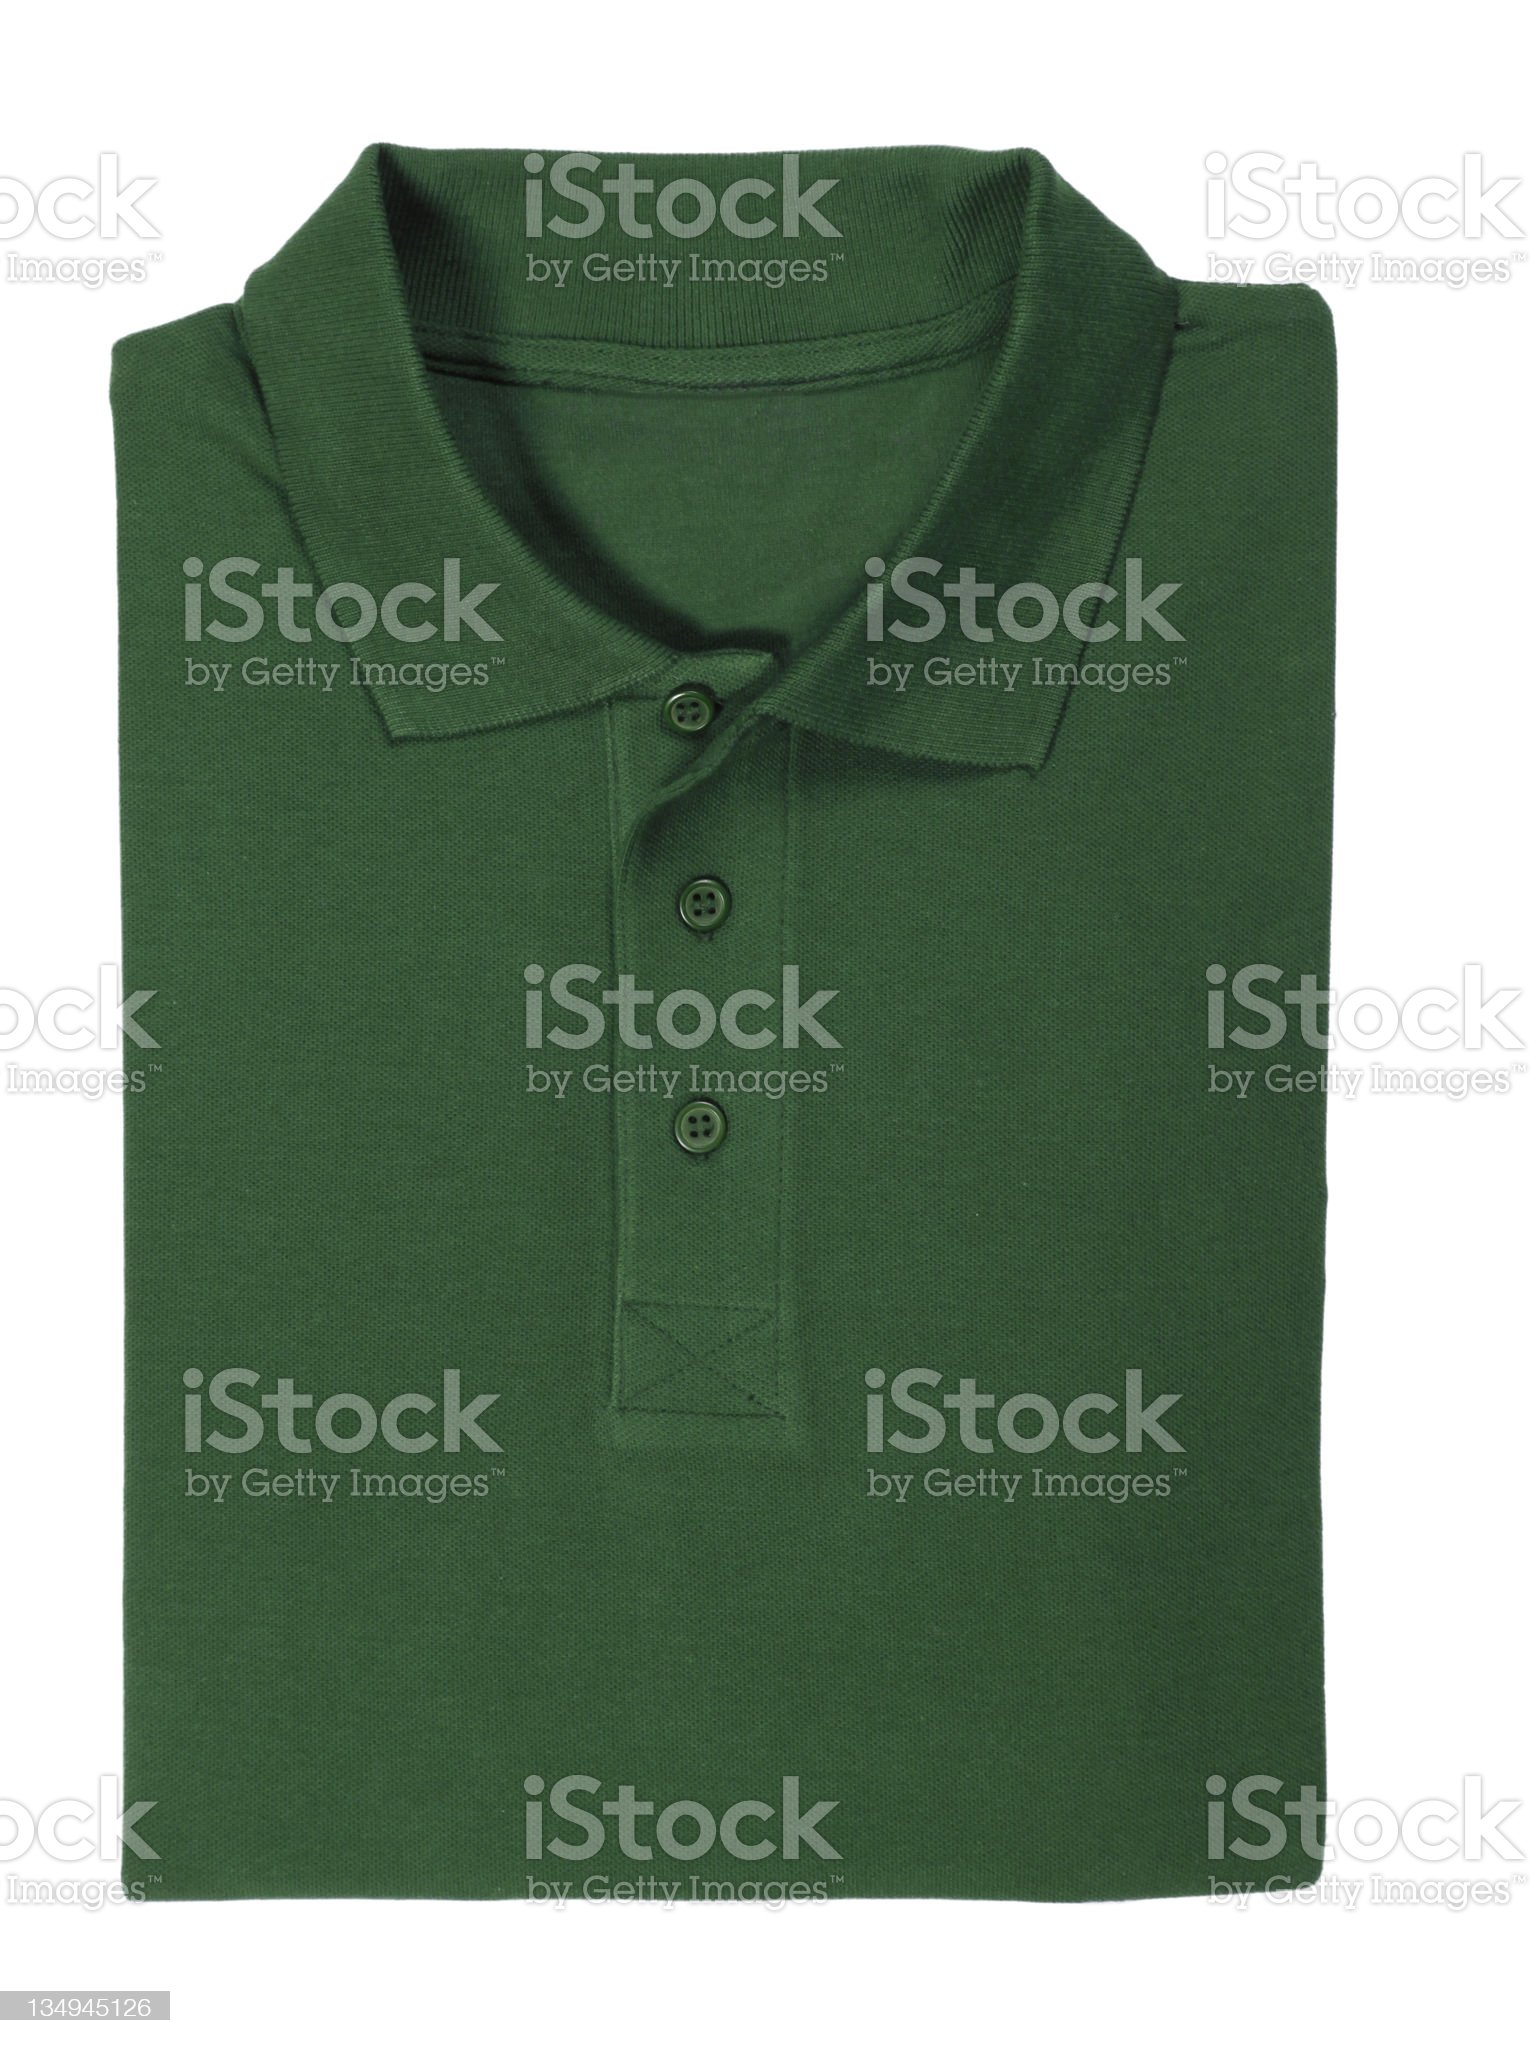 polo green shirt folded - clipping path royalty-free stock photo